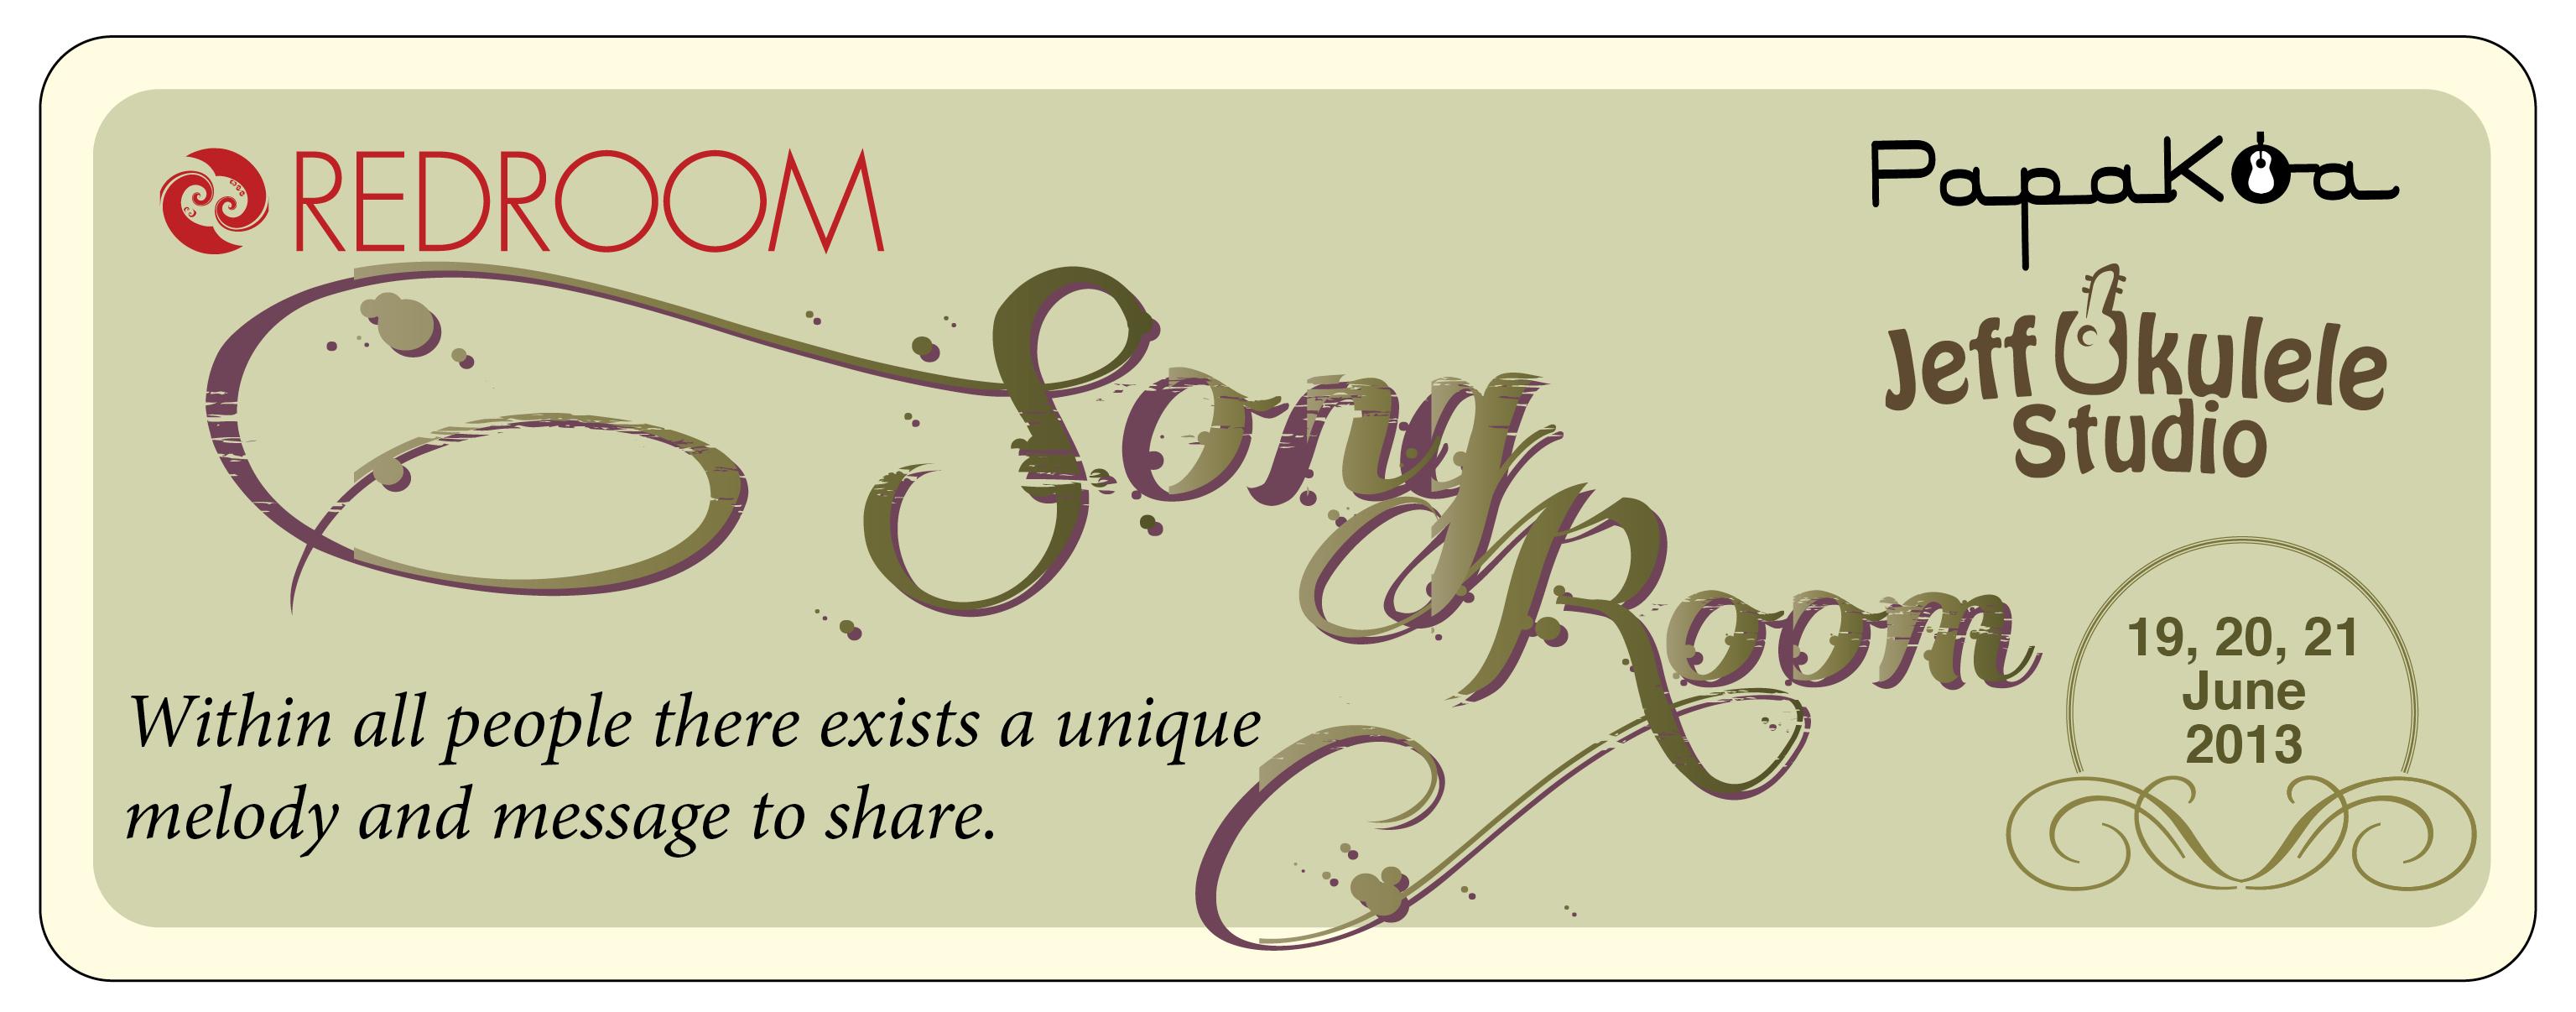 rr songroom 0613 mast